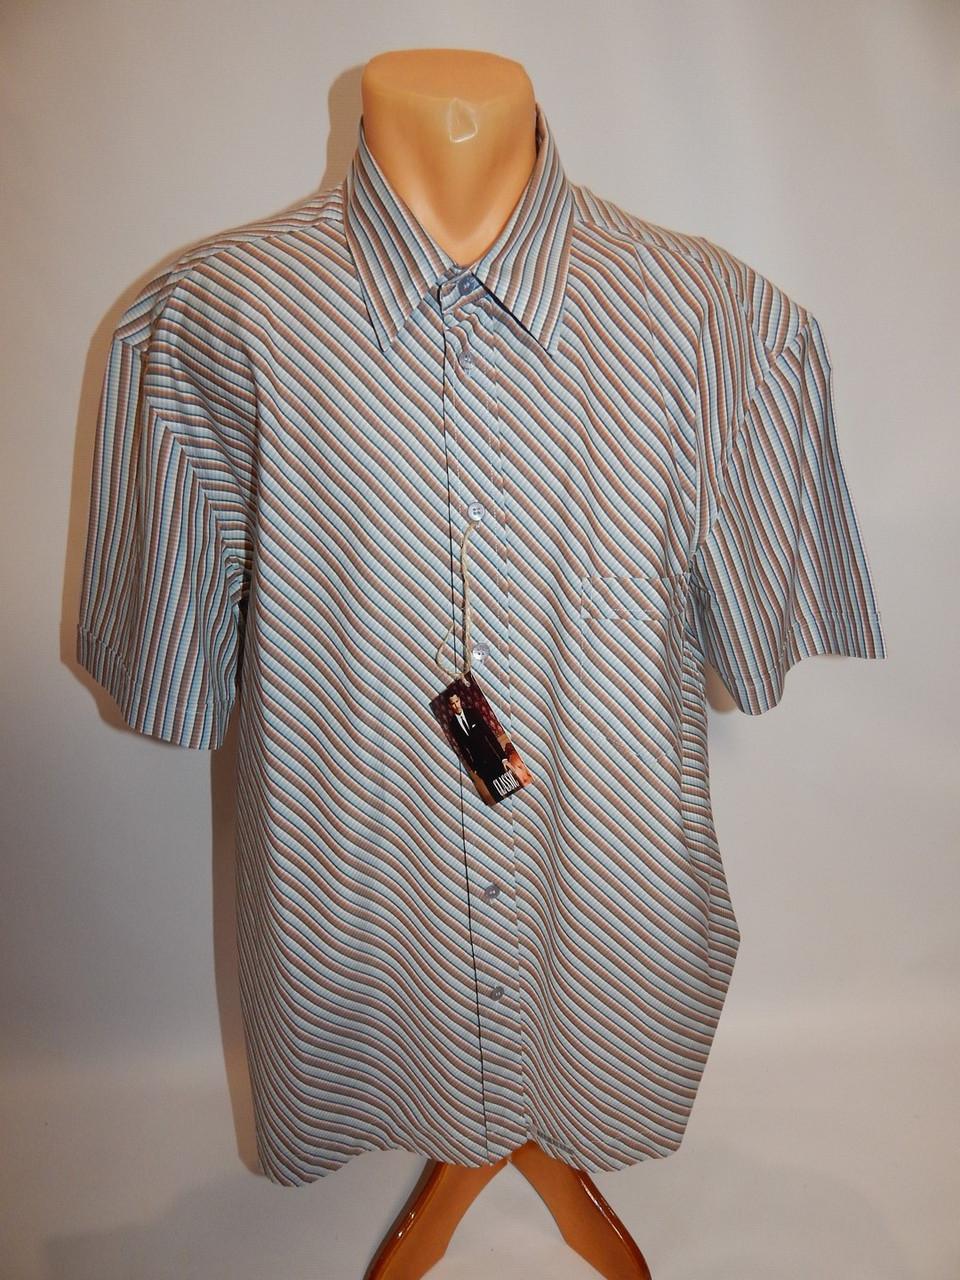 Мужская рубашка с коротким рукавом Ted Baker (083КР) р.52